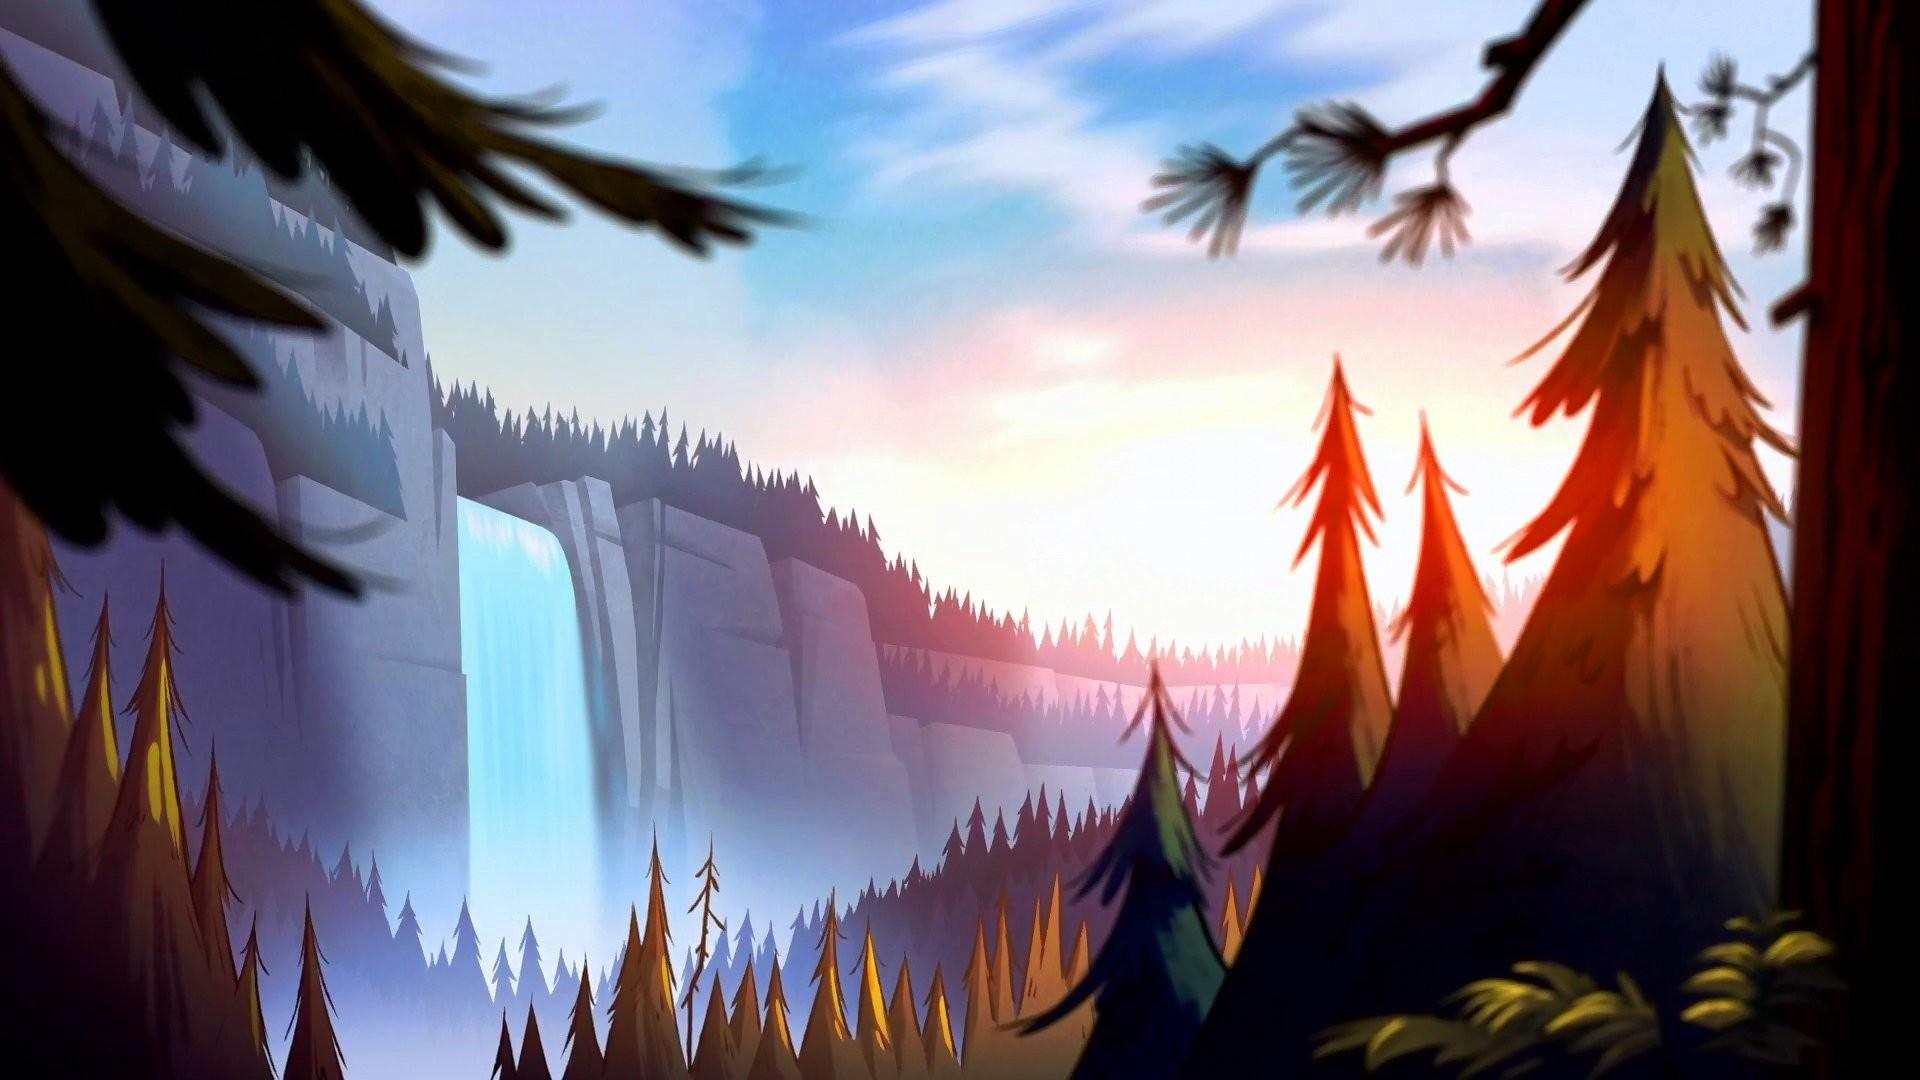 Gravity Falls HD Wallpaper (65+ Images